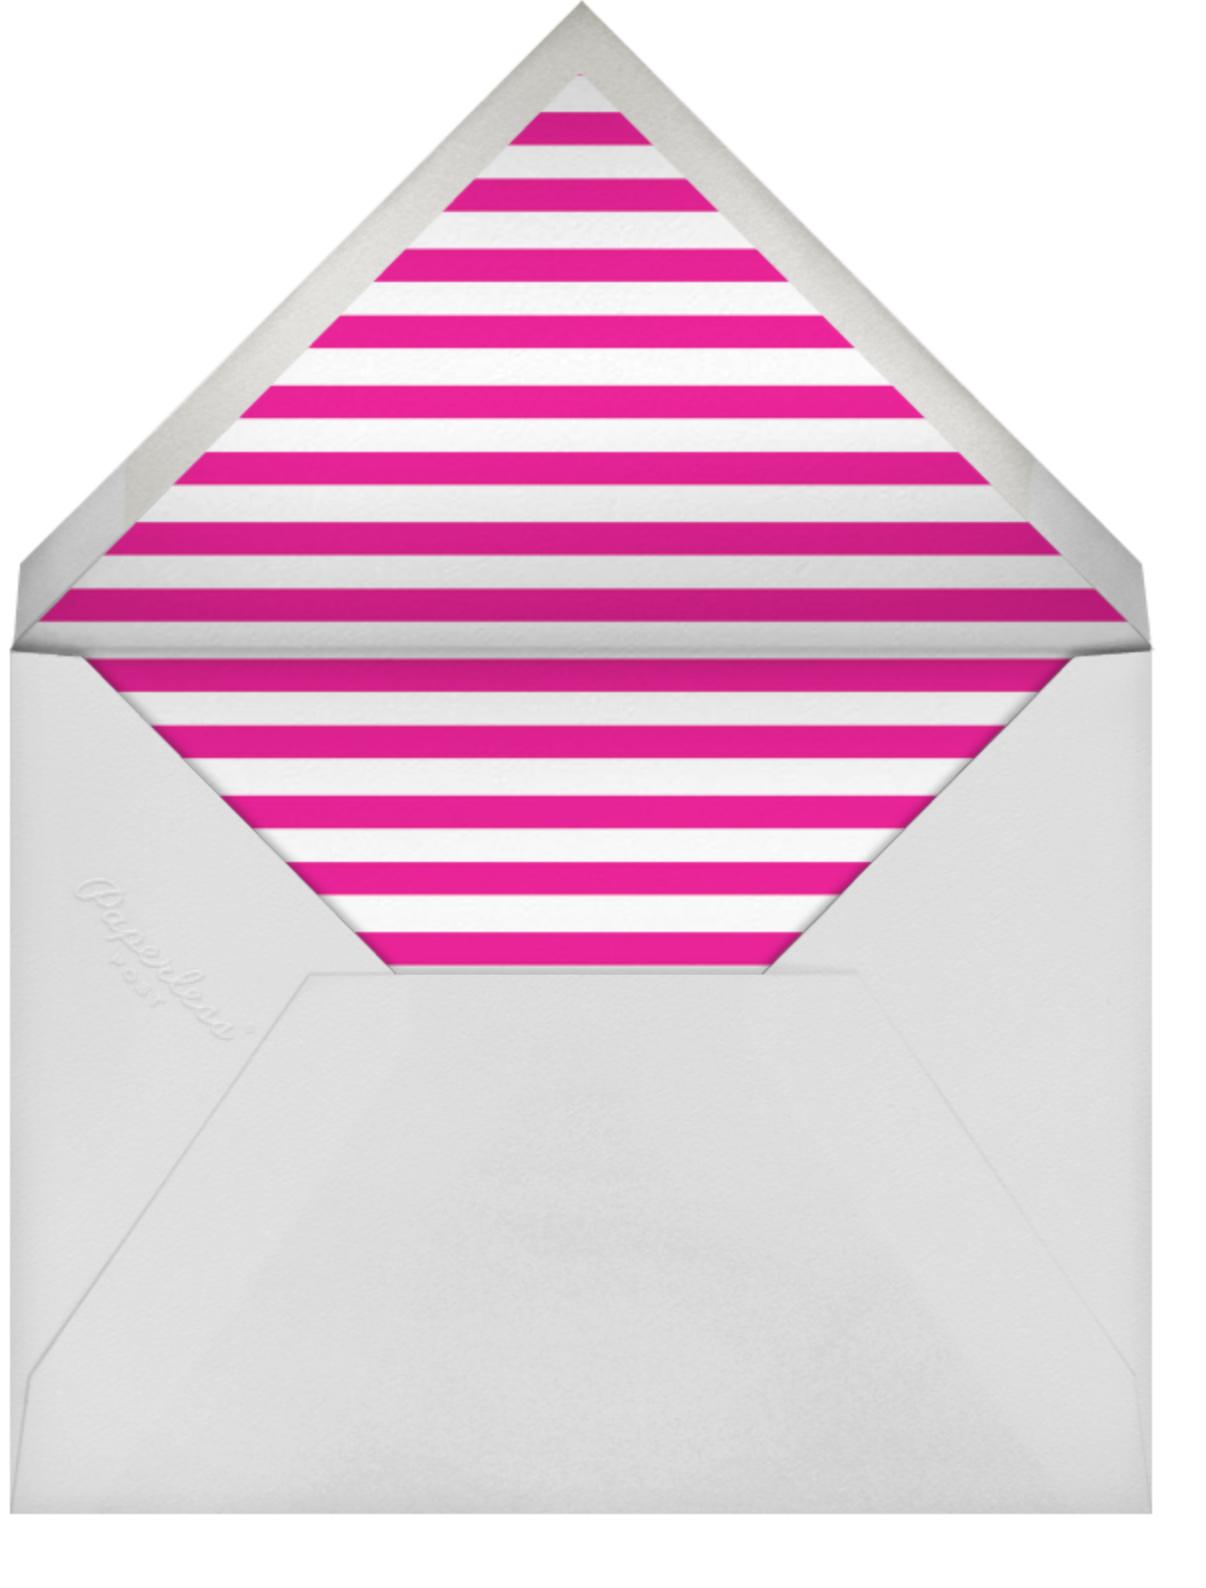 Evergreen Stripes - Red/Pink - kate spade new york - Summer parties - envelope back